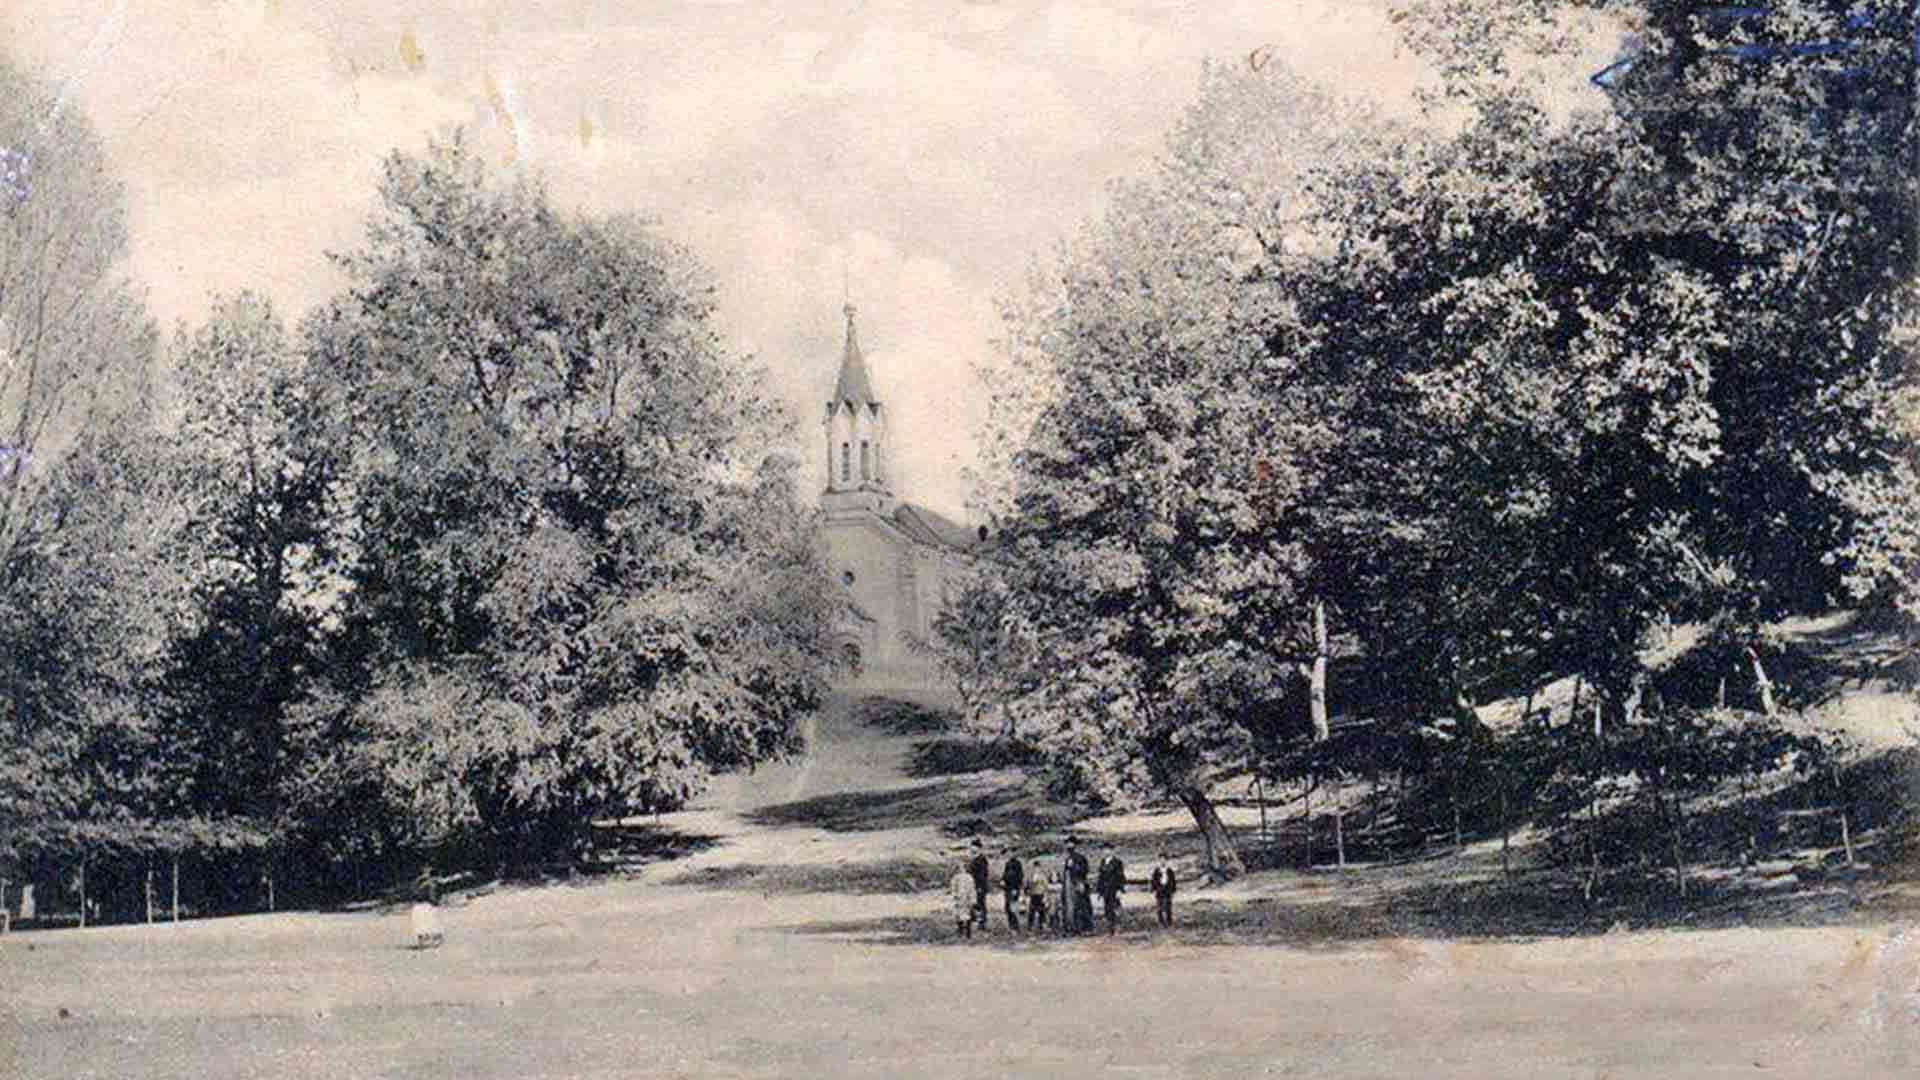 Црква у Белановици - 1911. година